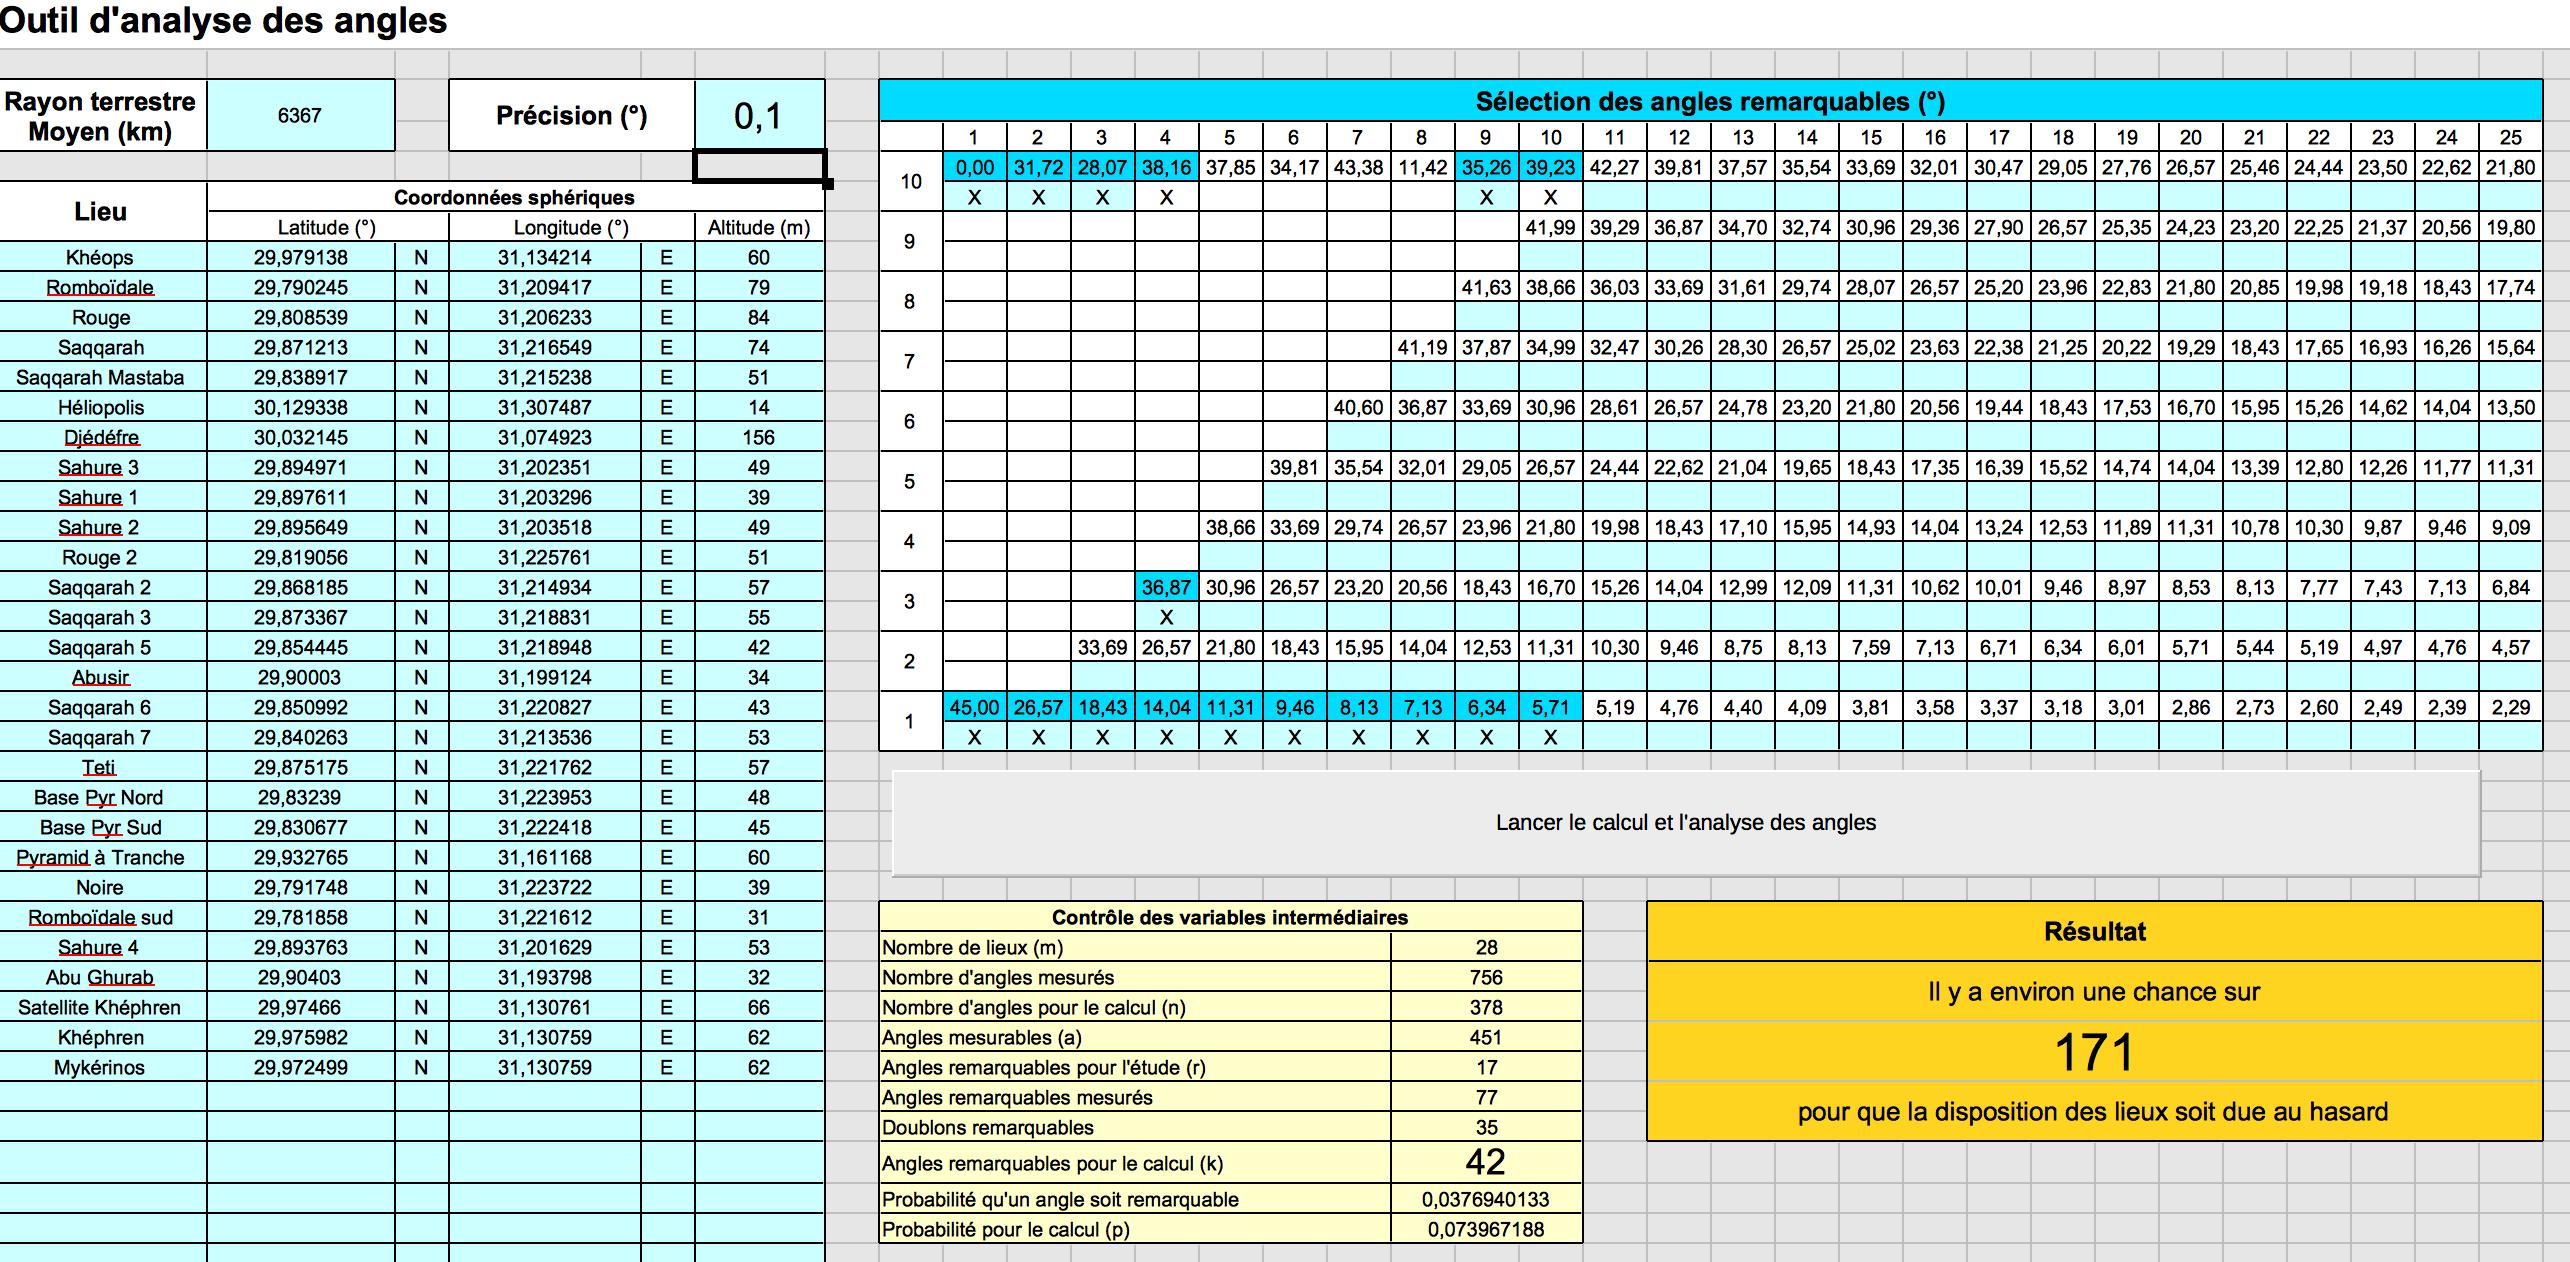 2017-11-16 23:19:18